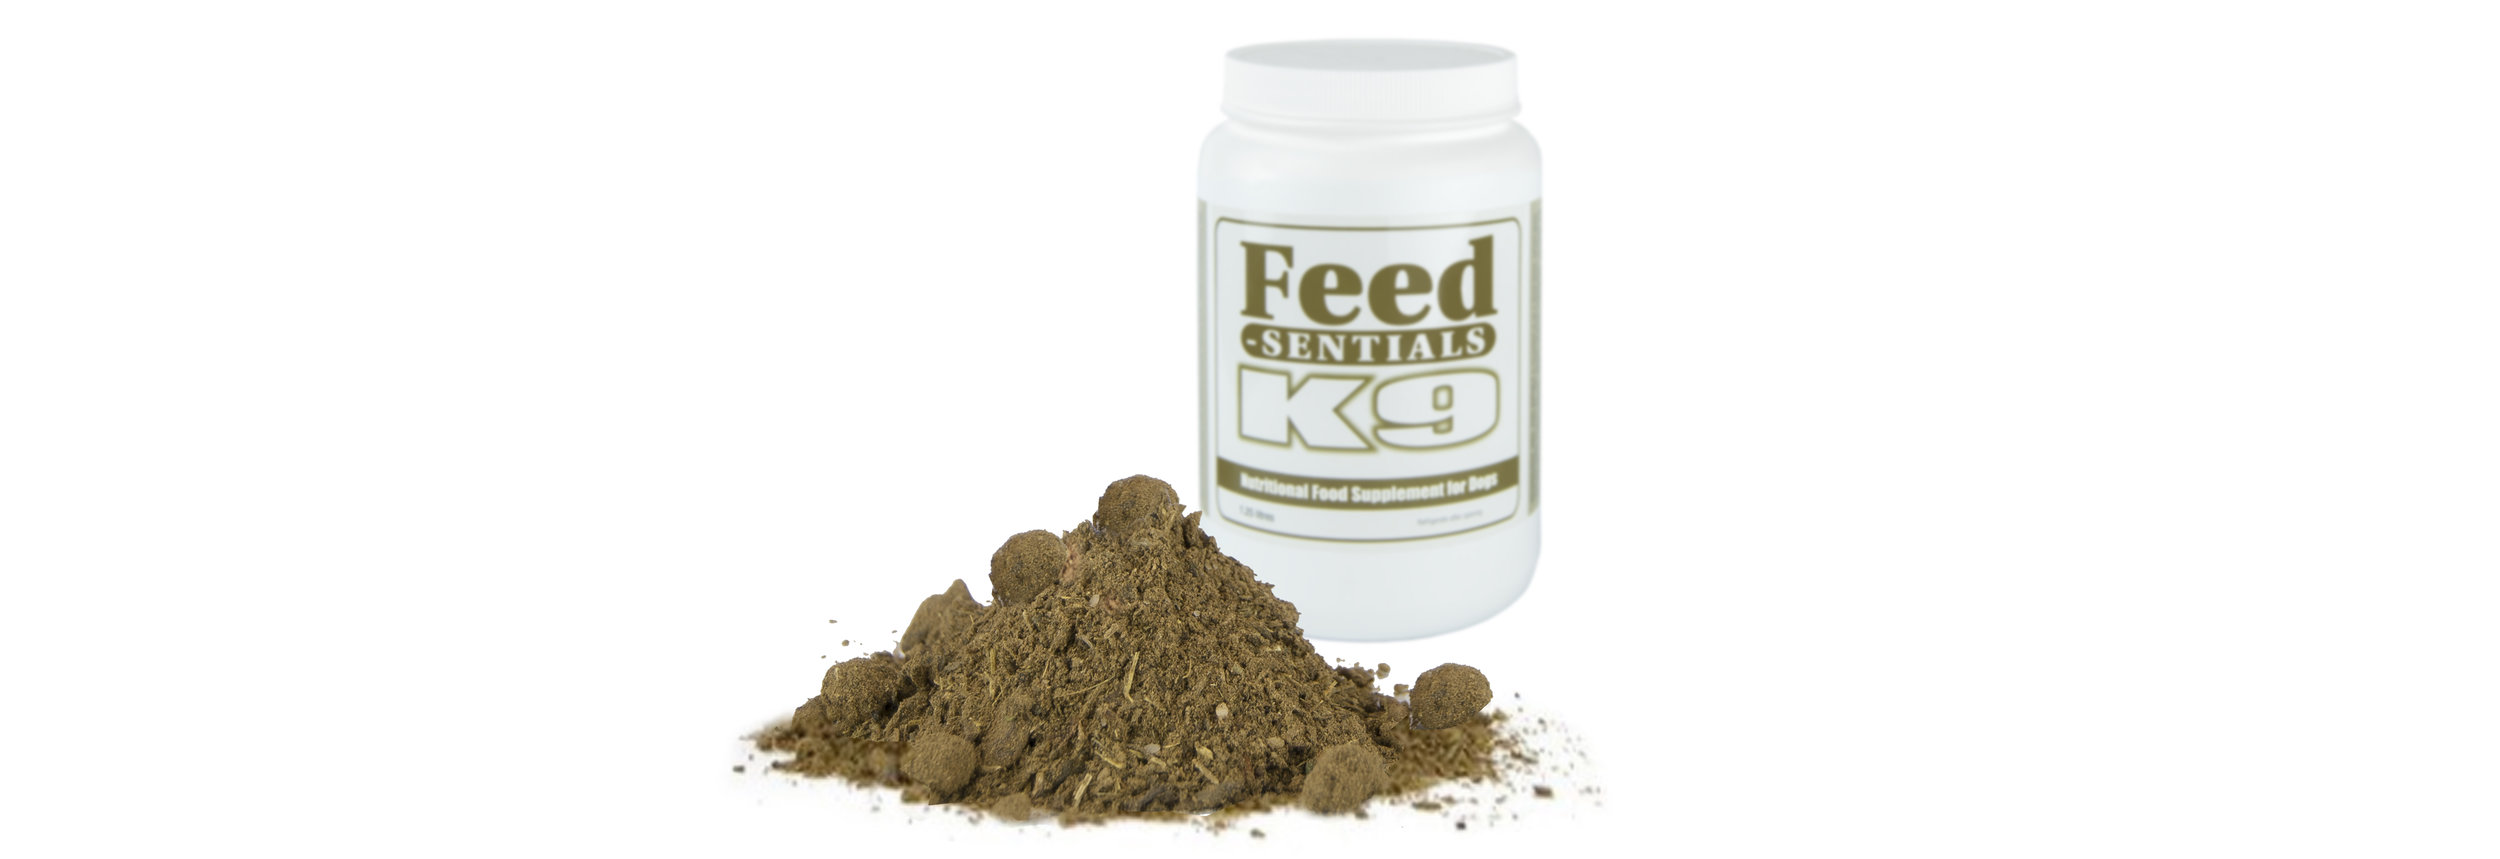 Feedsentials Powder .jpg